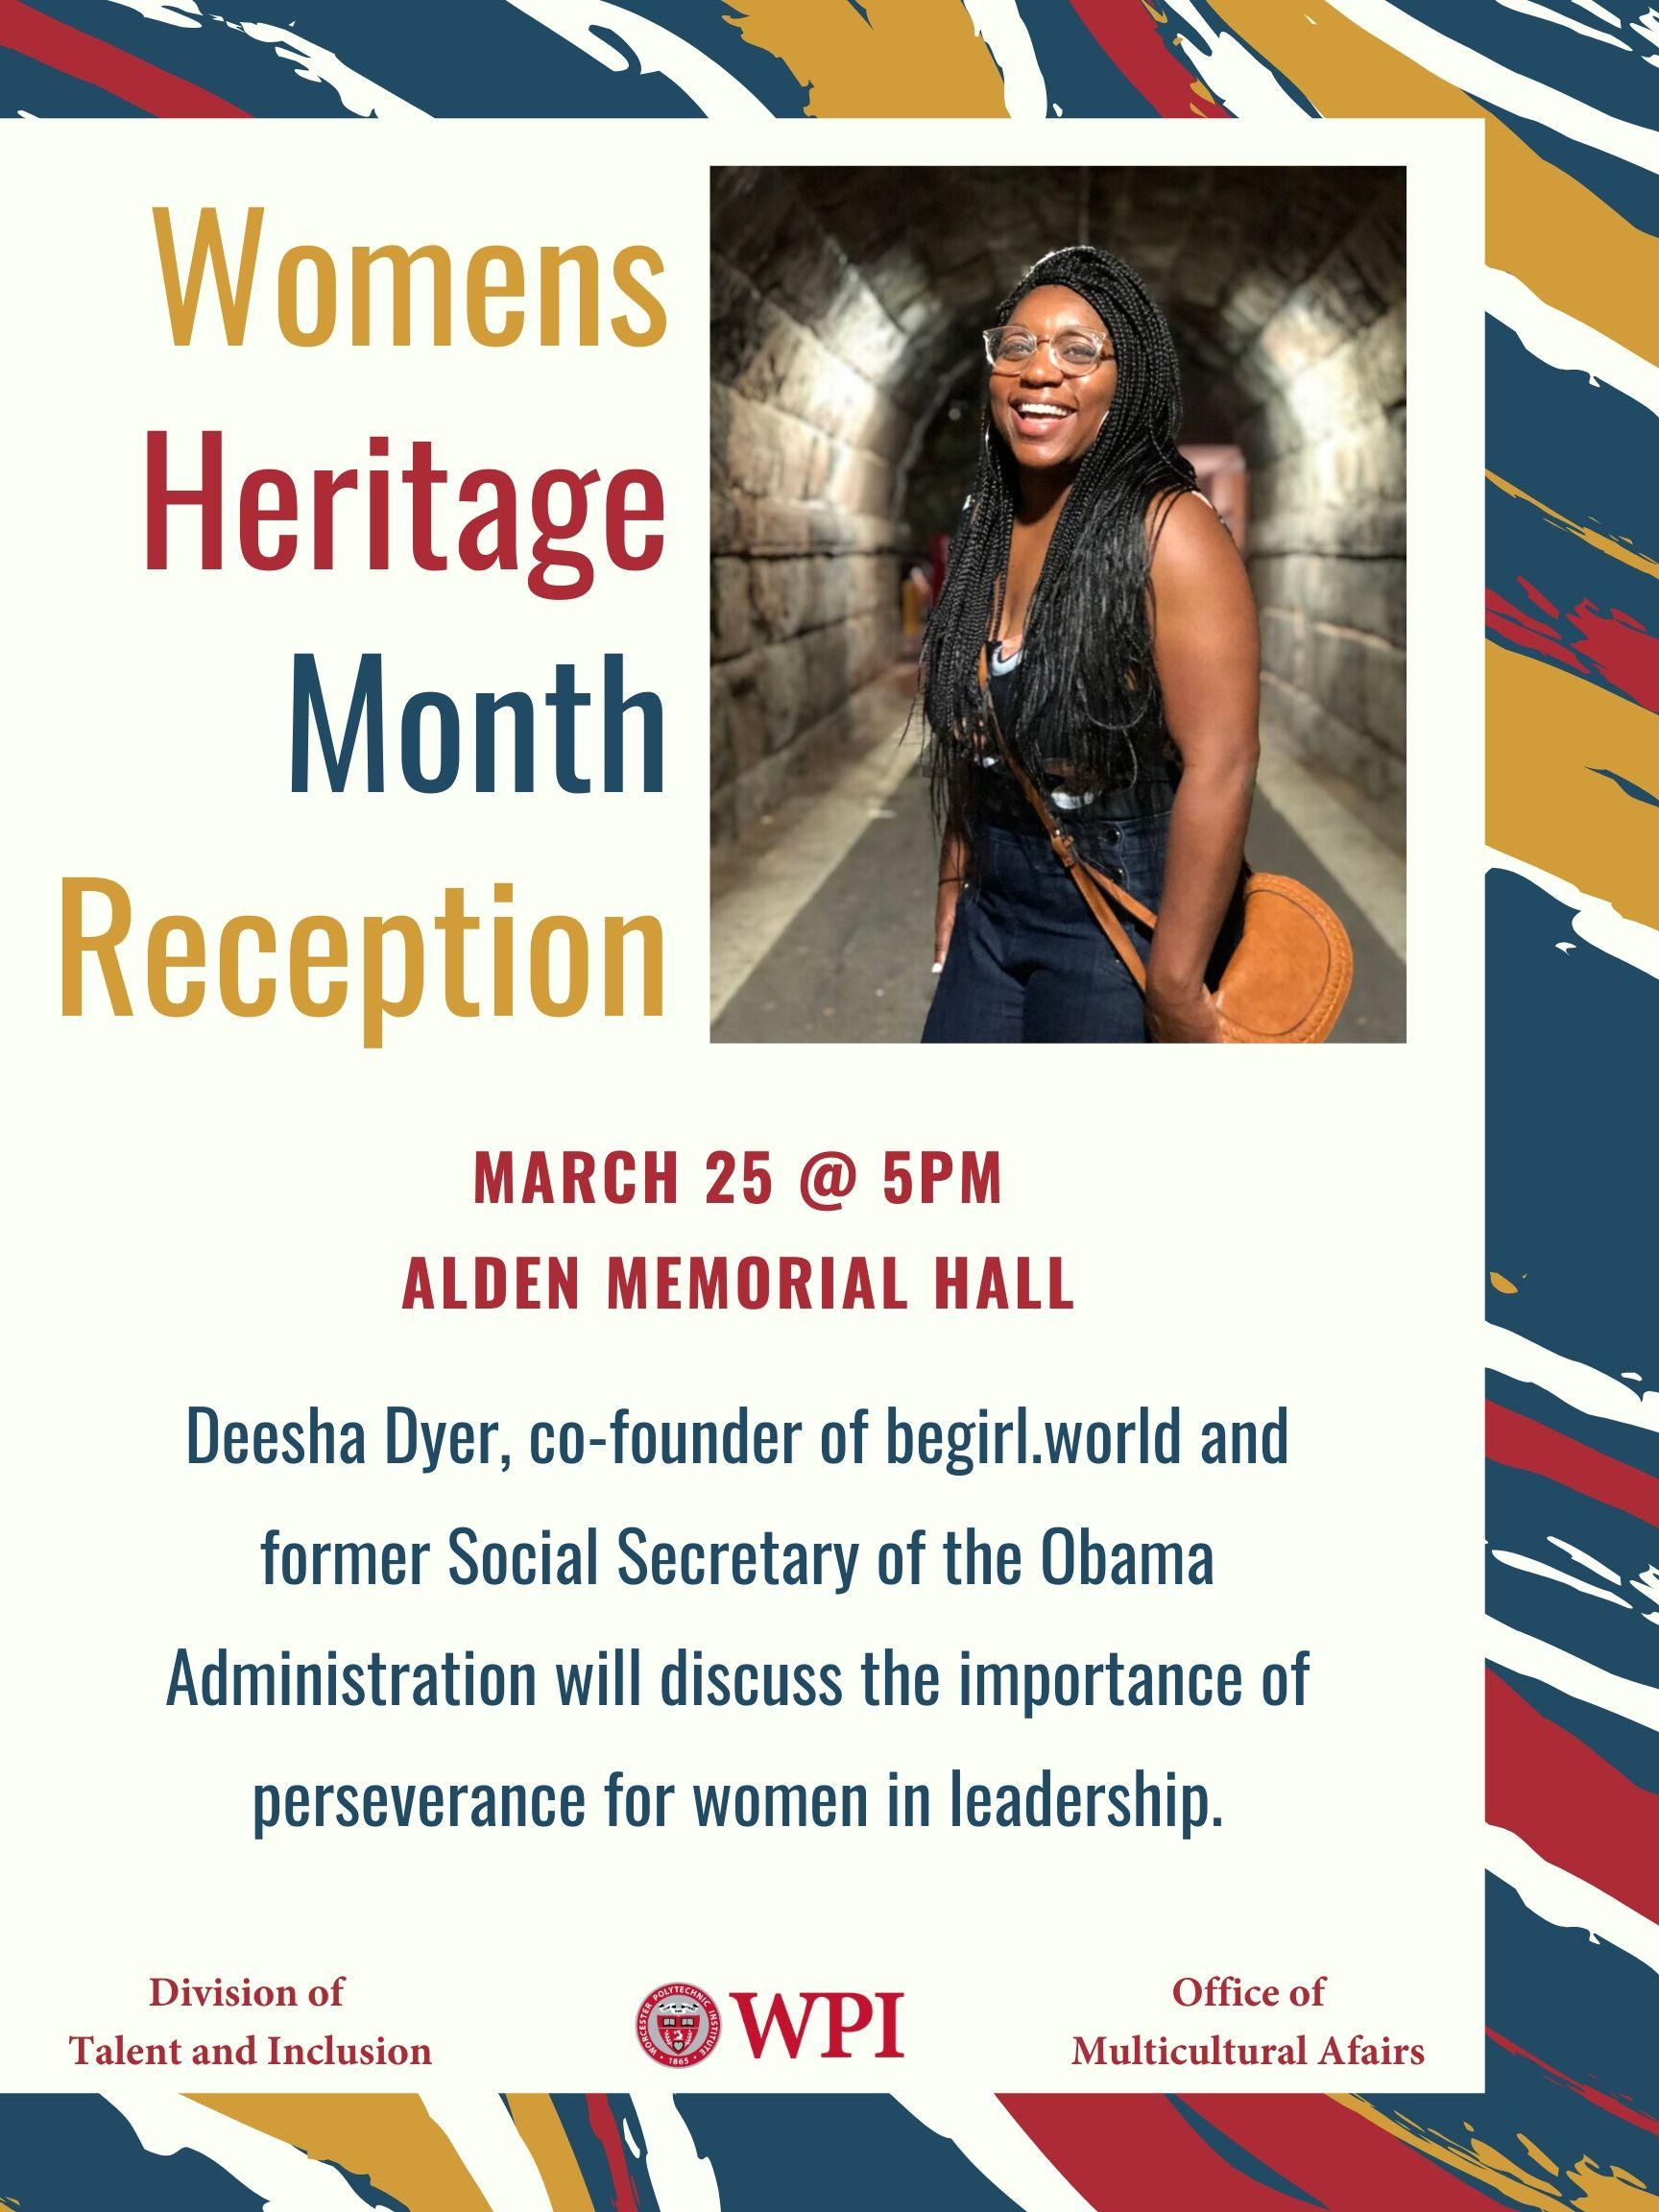 Deesha Dyer Women's Heritage Month Reception